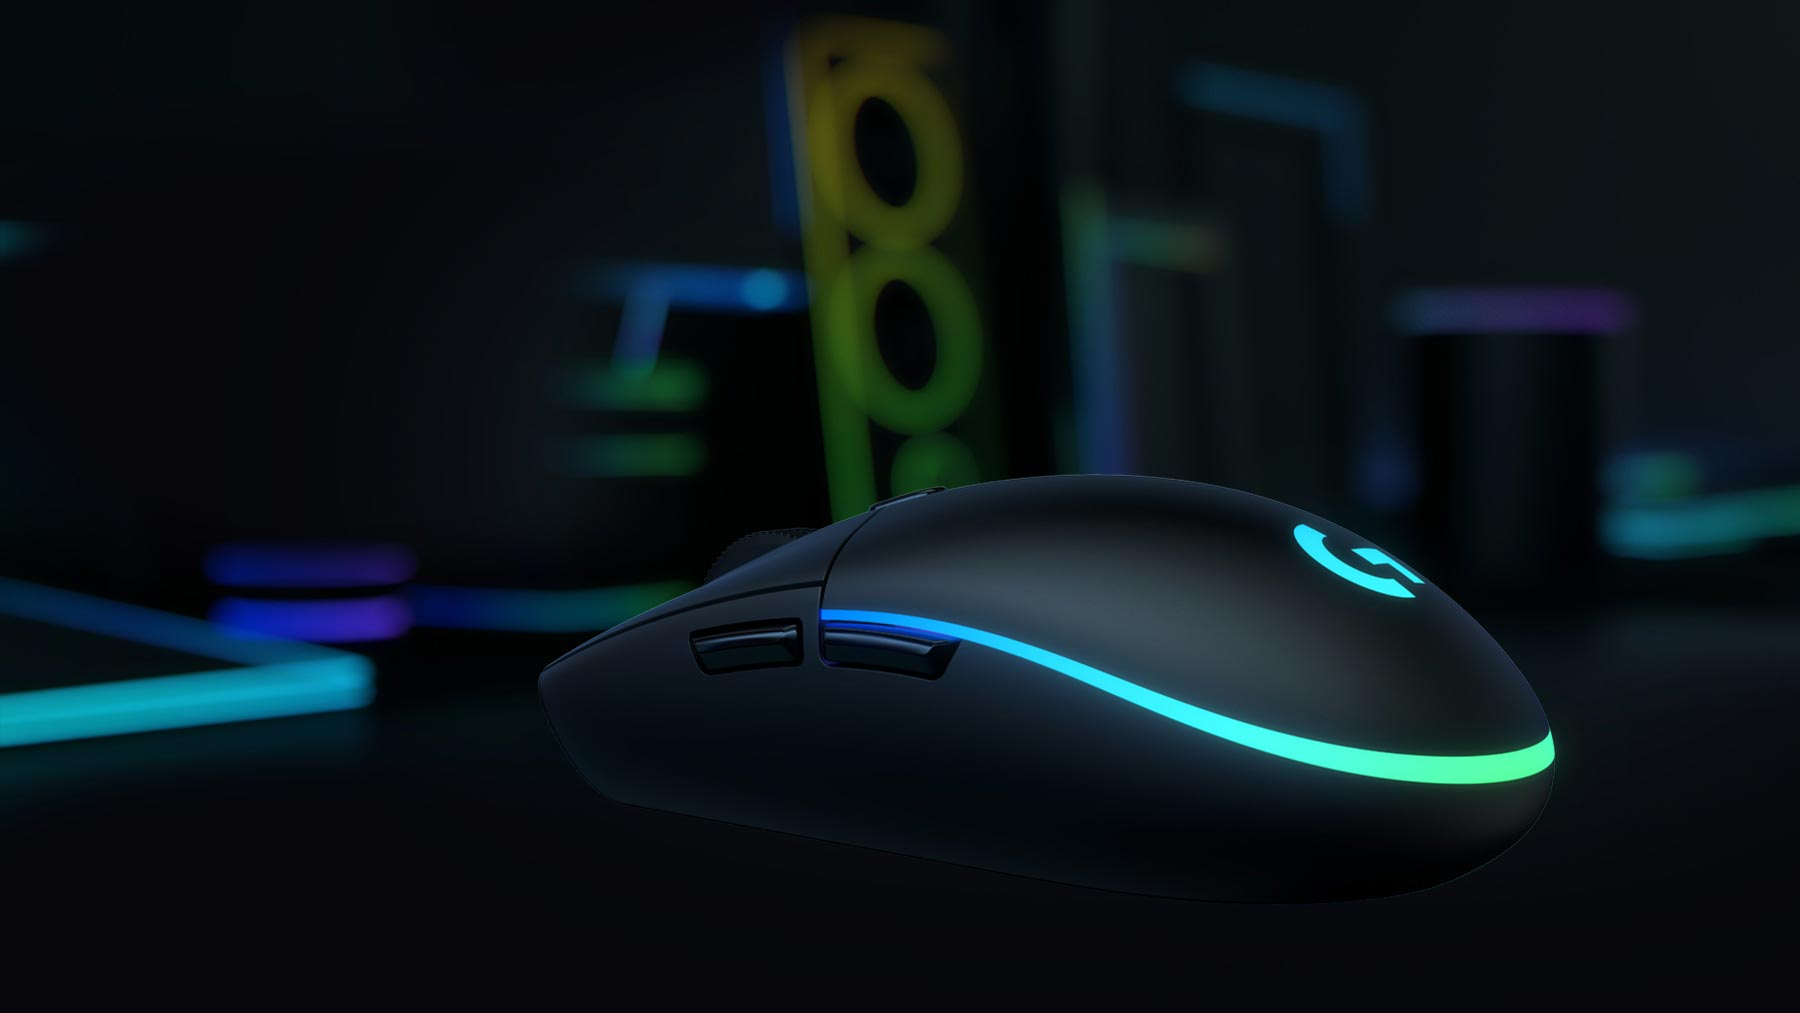 Chuột máy tính Logitech